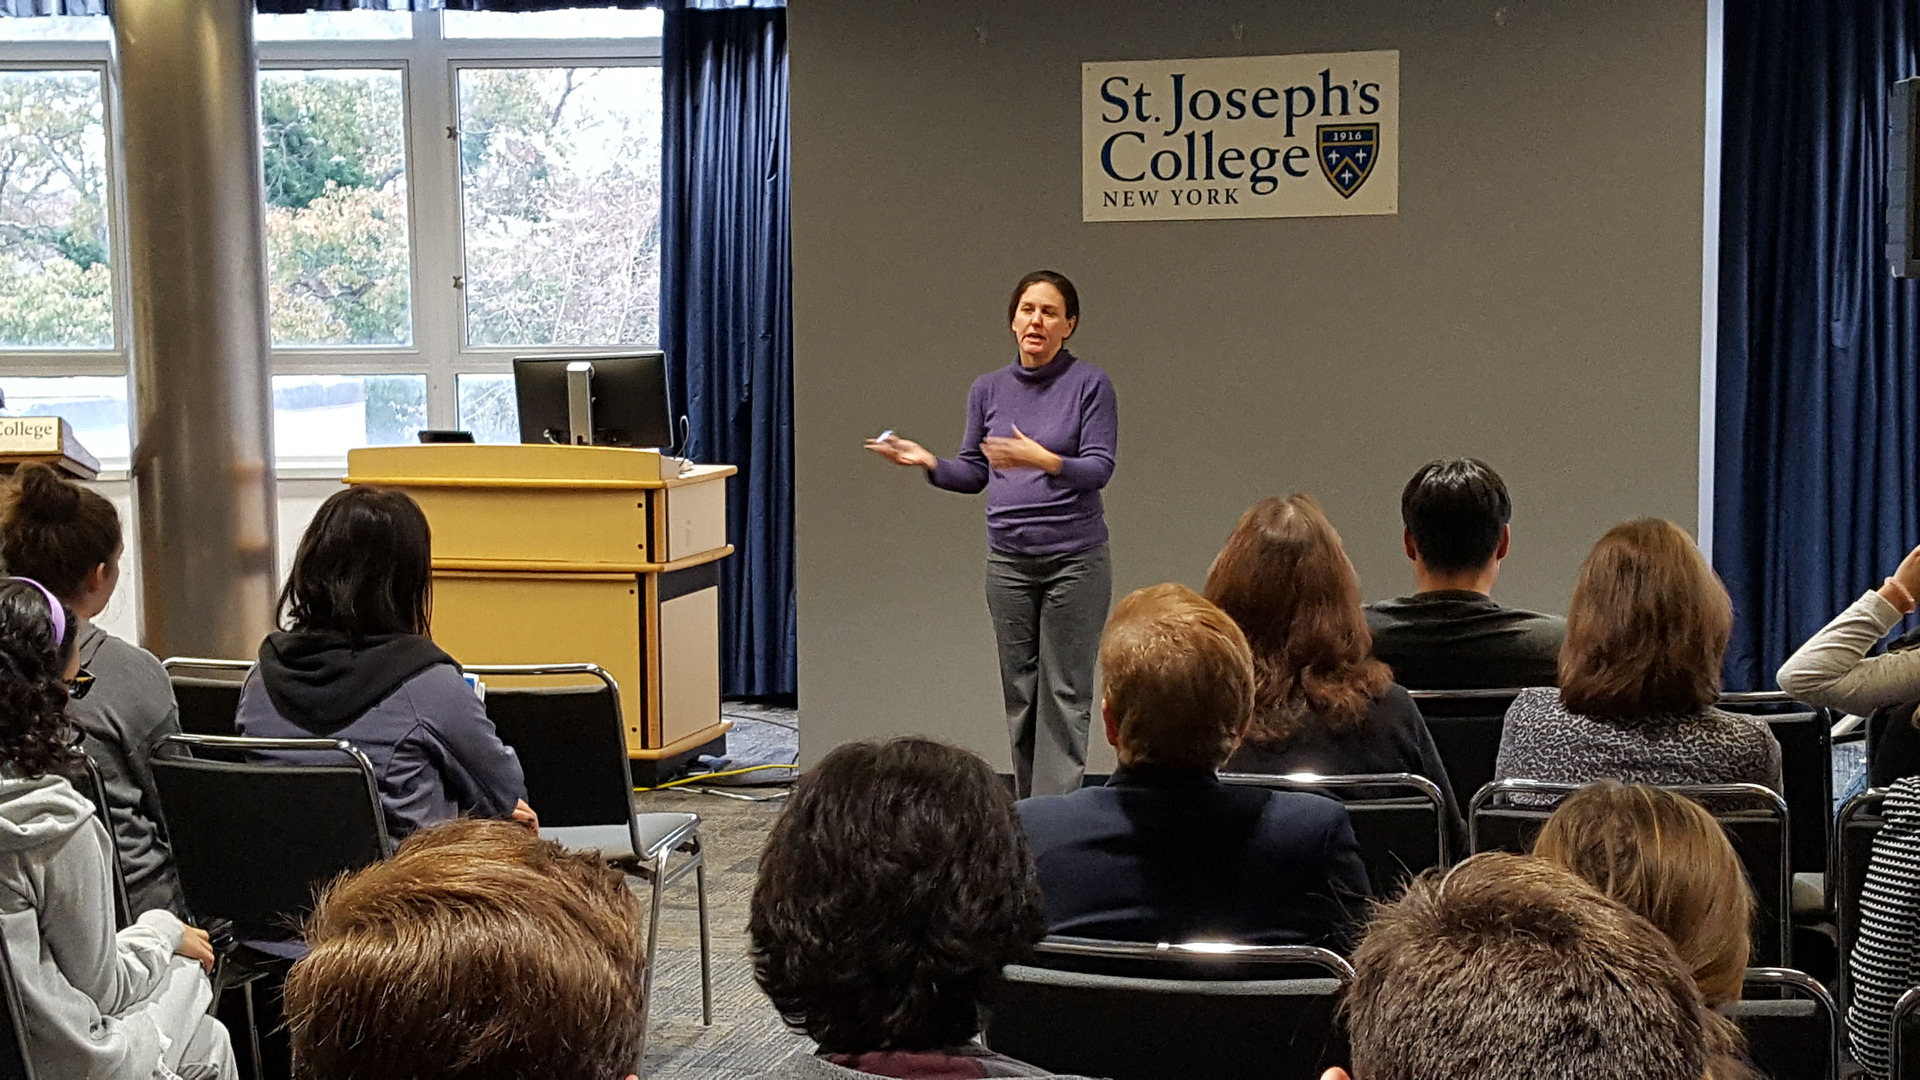 Deborah Horan speaking during a common hour event at SJC Long Island.